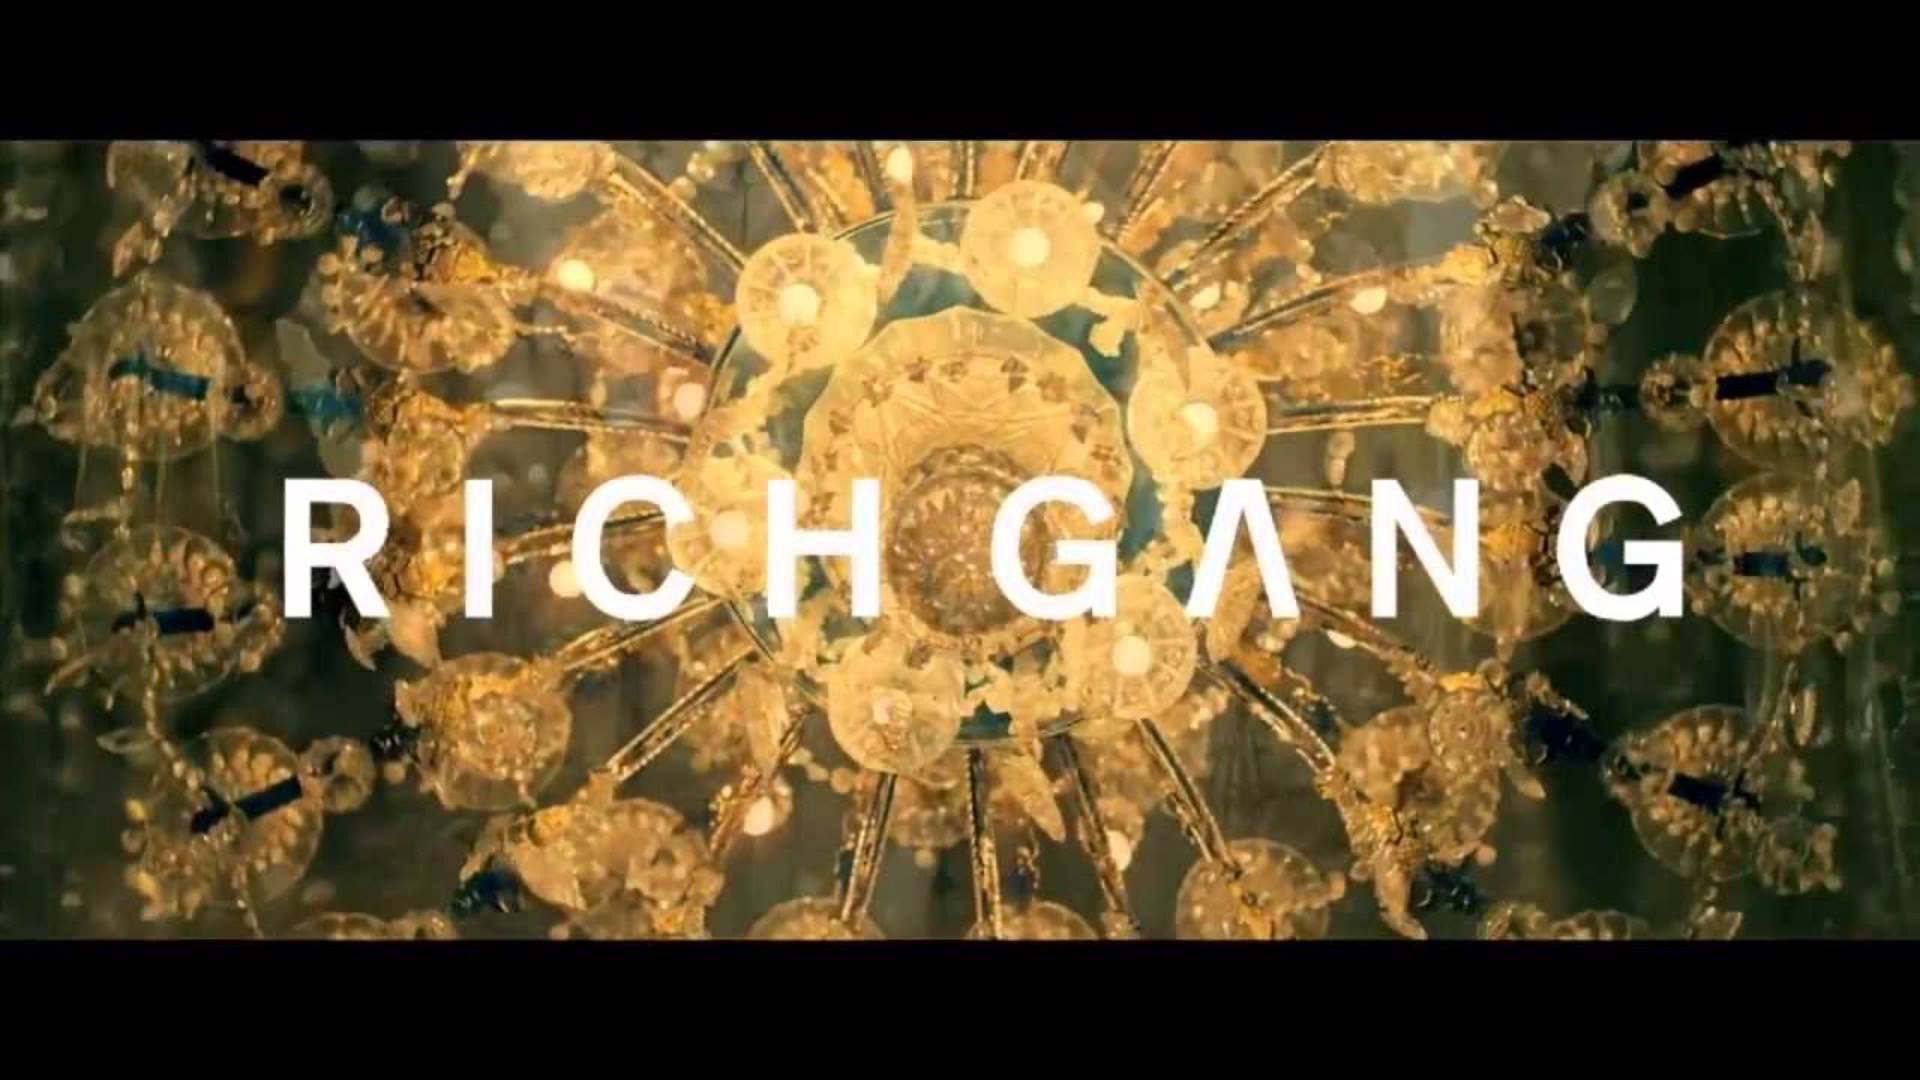 Rich Gang Wallpapers